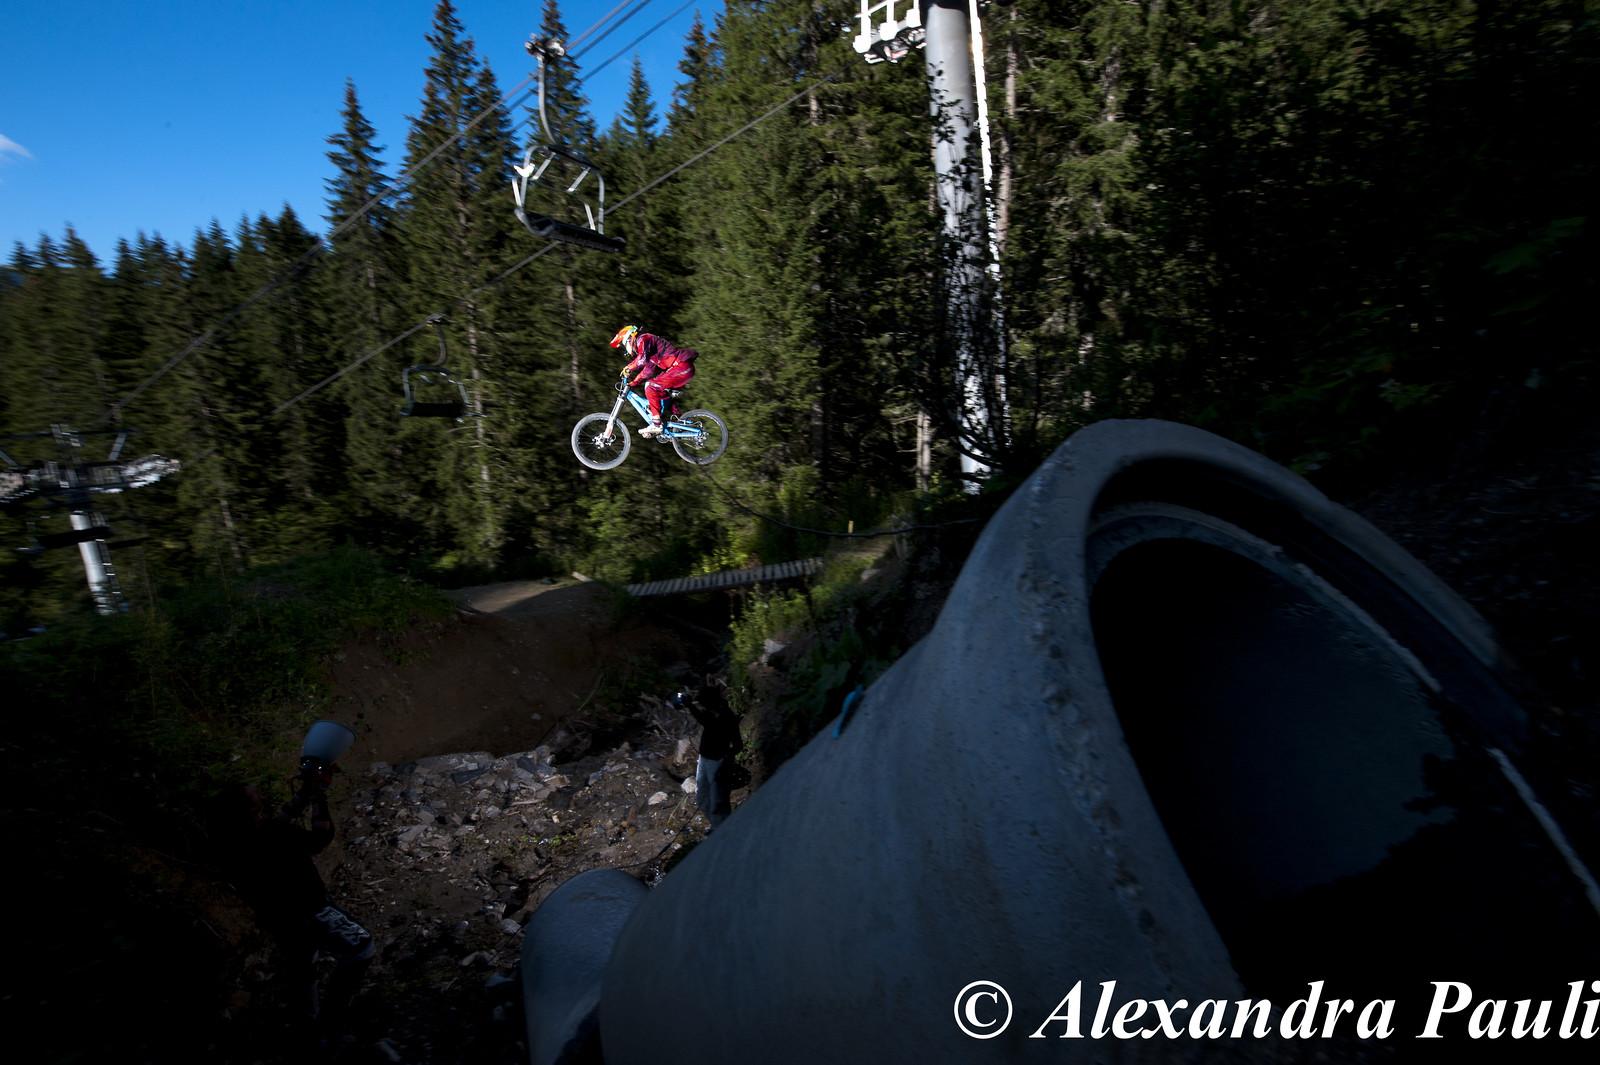 Chatel/Portes du Soleil - Tiberius - Mountain Biking Pictures - Vital MTB